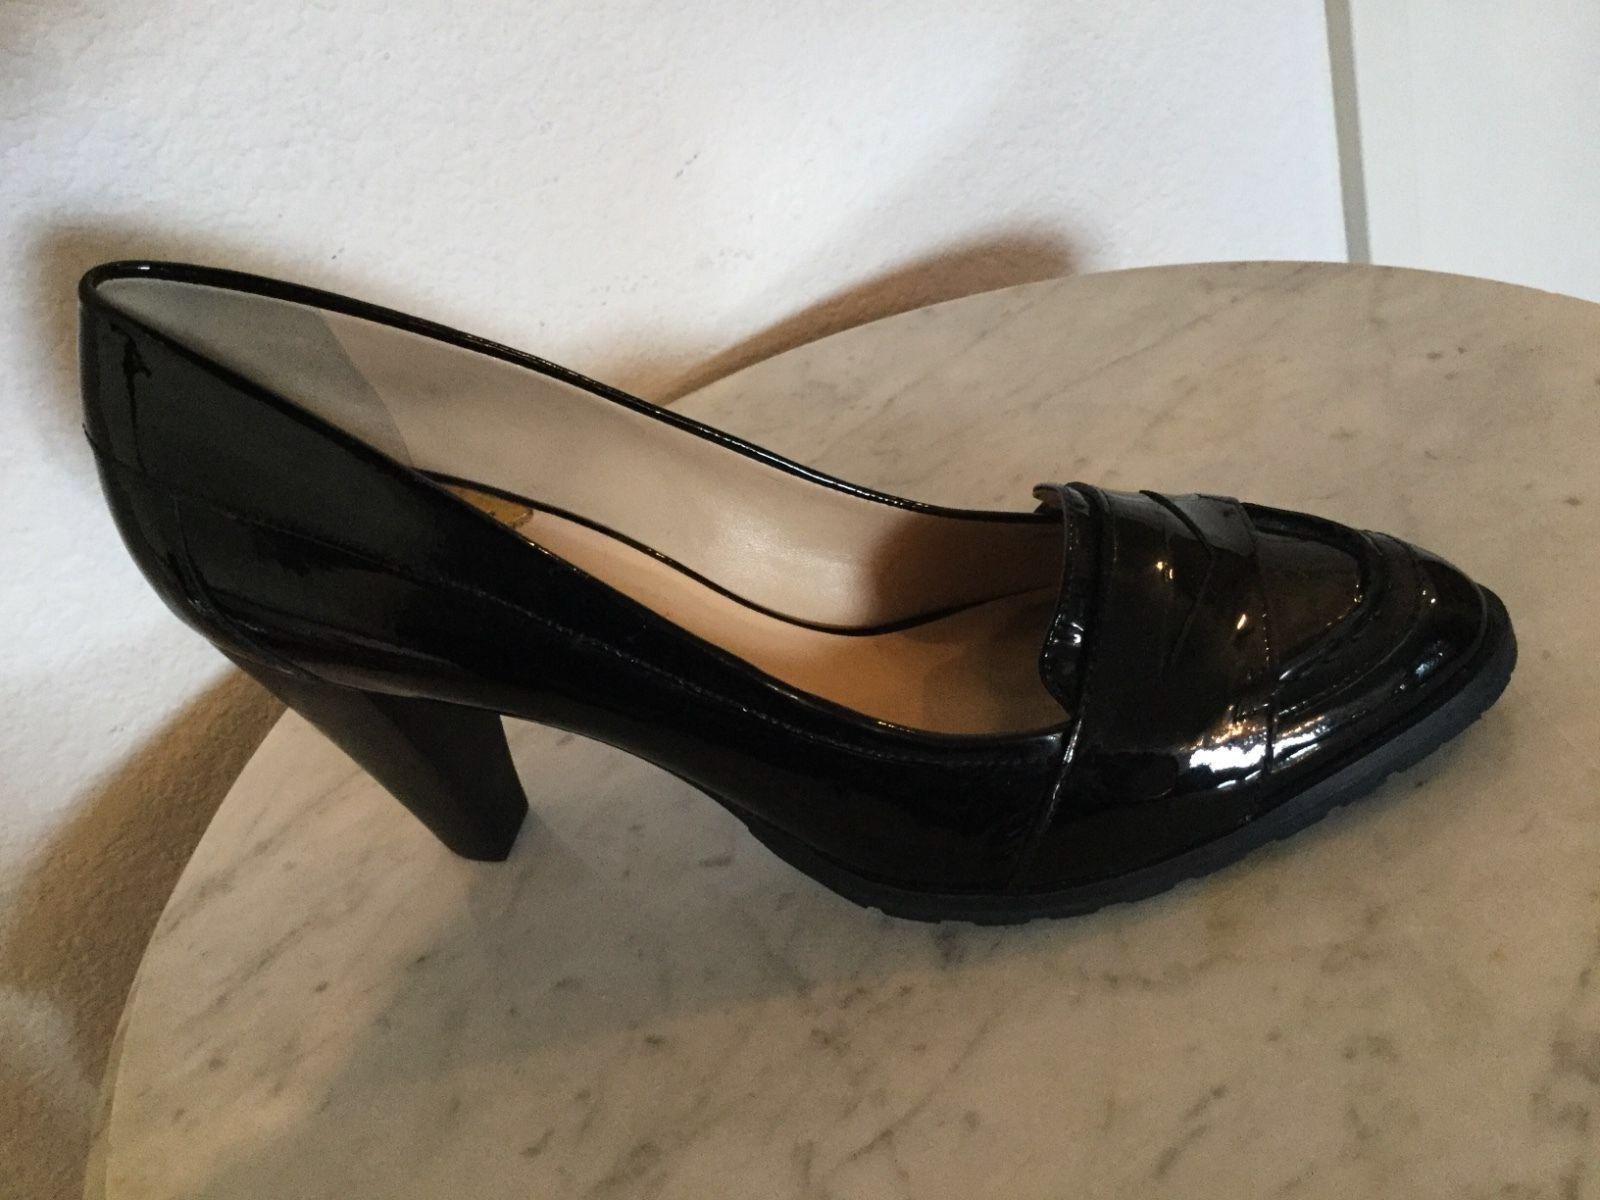 Cole Hann Women's Penny Black Patent Leather Pump. U.S Size 10.5 B. Brazil Made.